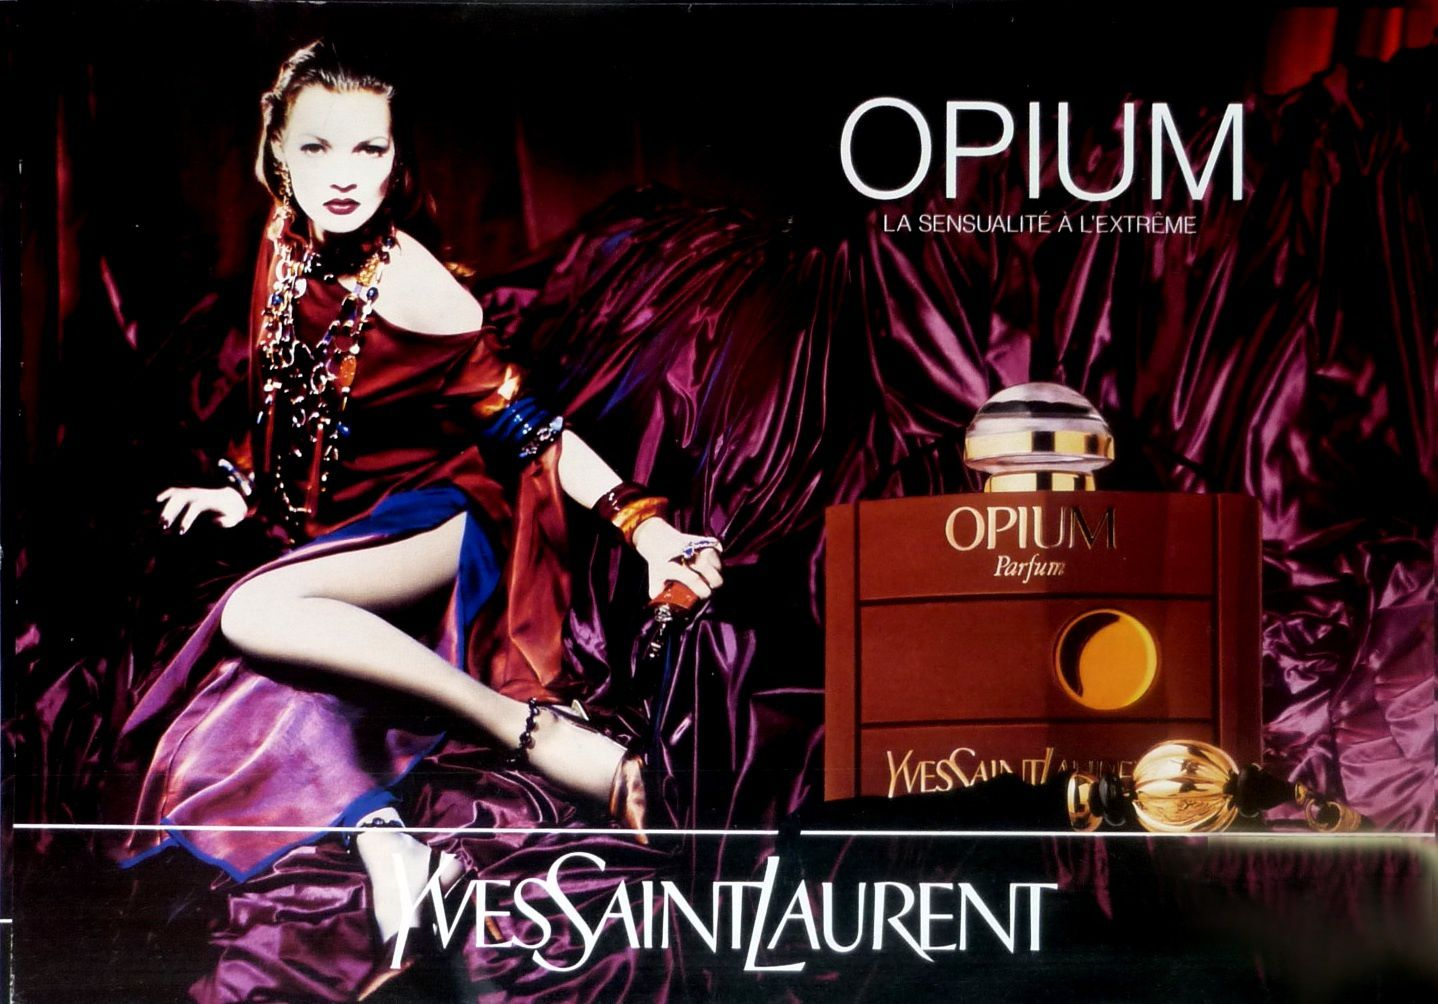 Opium d'Yves SAINT LAURENT